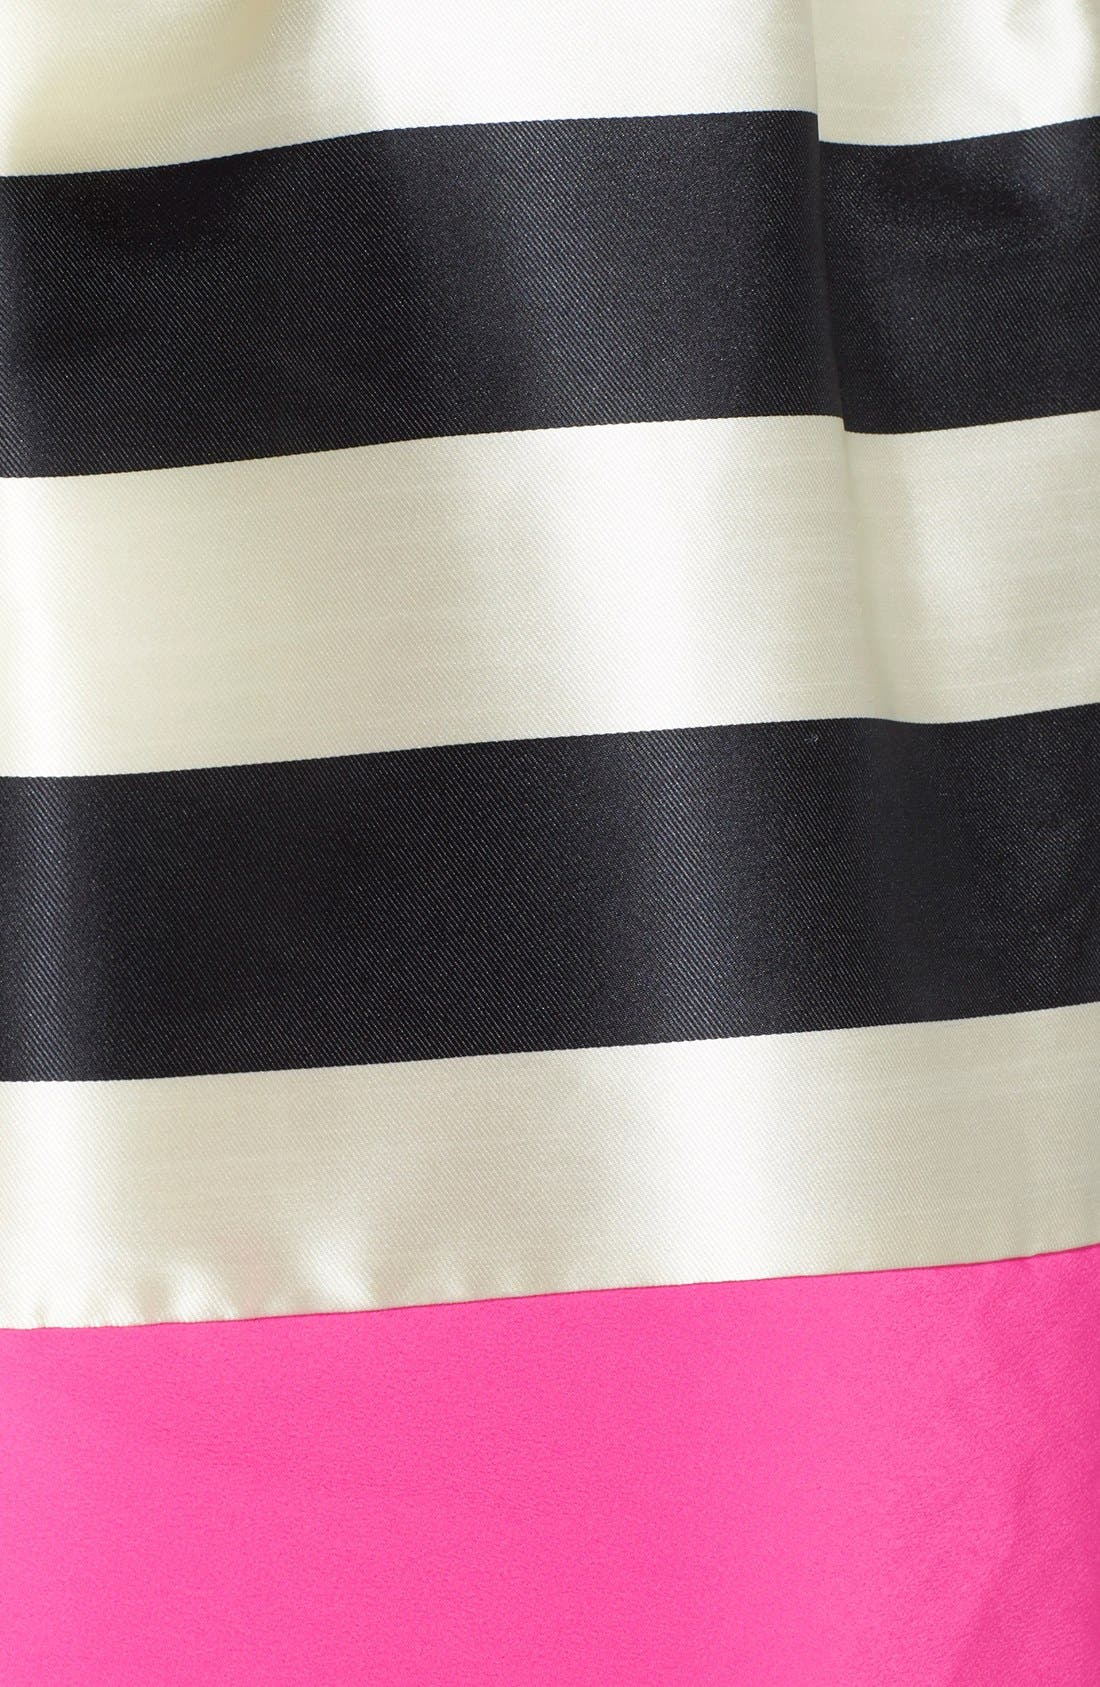 Stripe Crepe Fit & Flare Dress,                             Alternate thumbnail 4, color,                             011